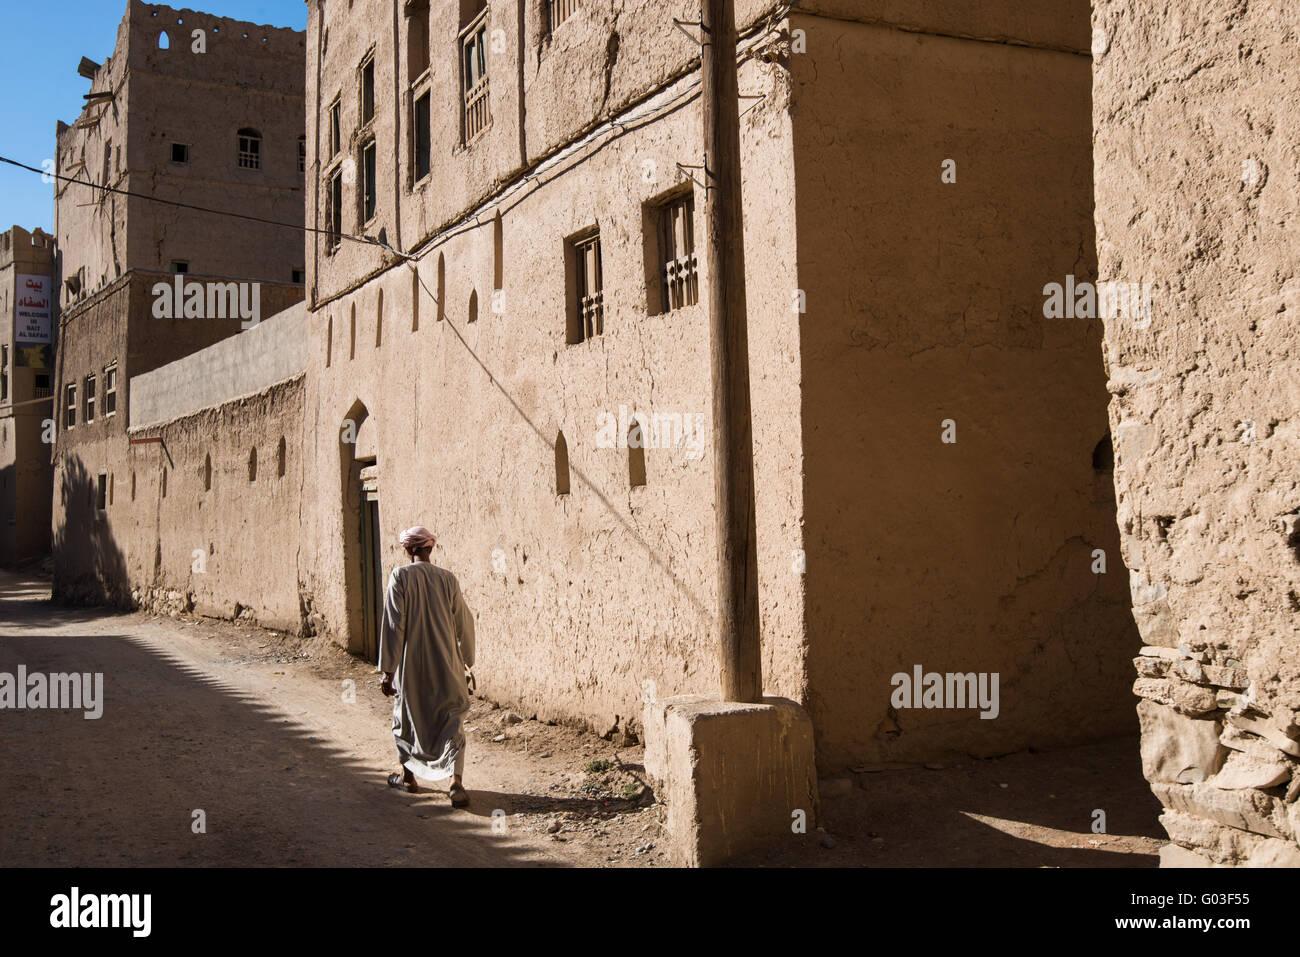 Man walking in the abandoned Al Hamra village, Oman. - Stock Image